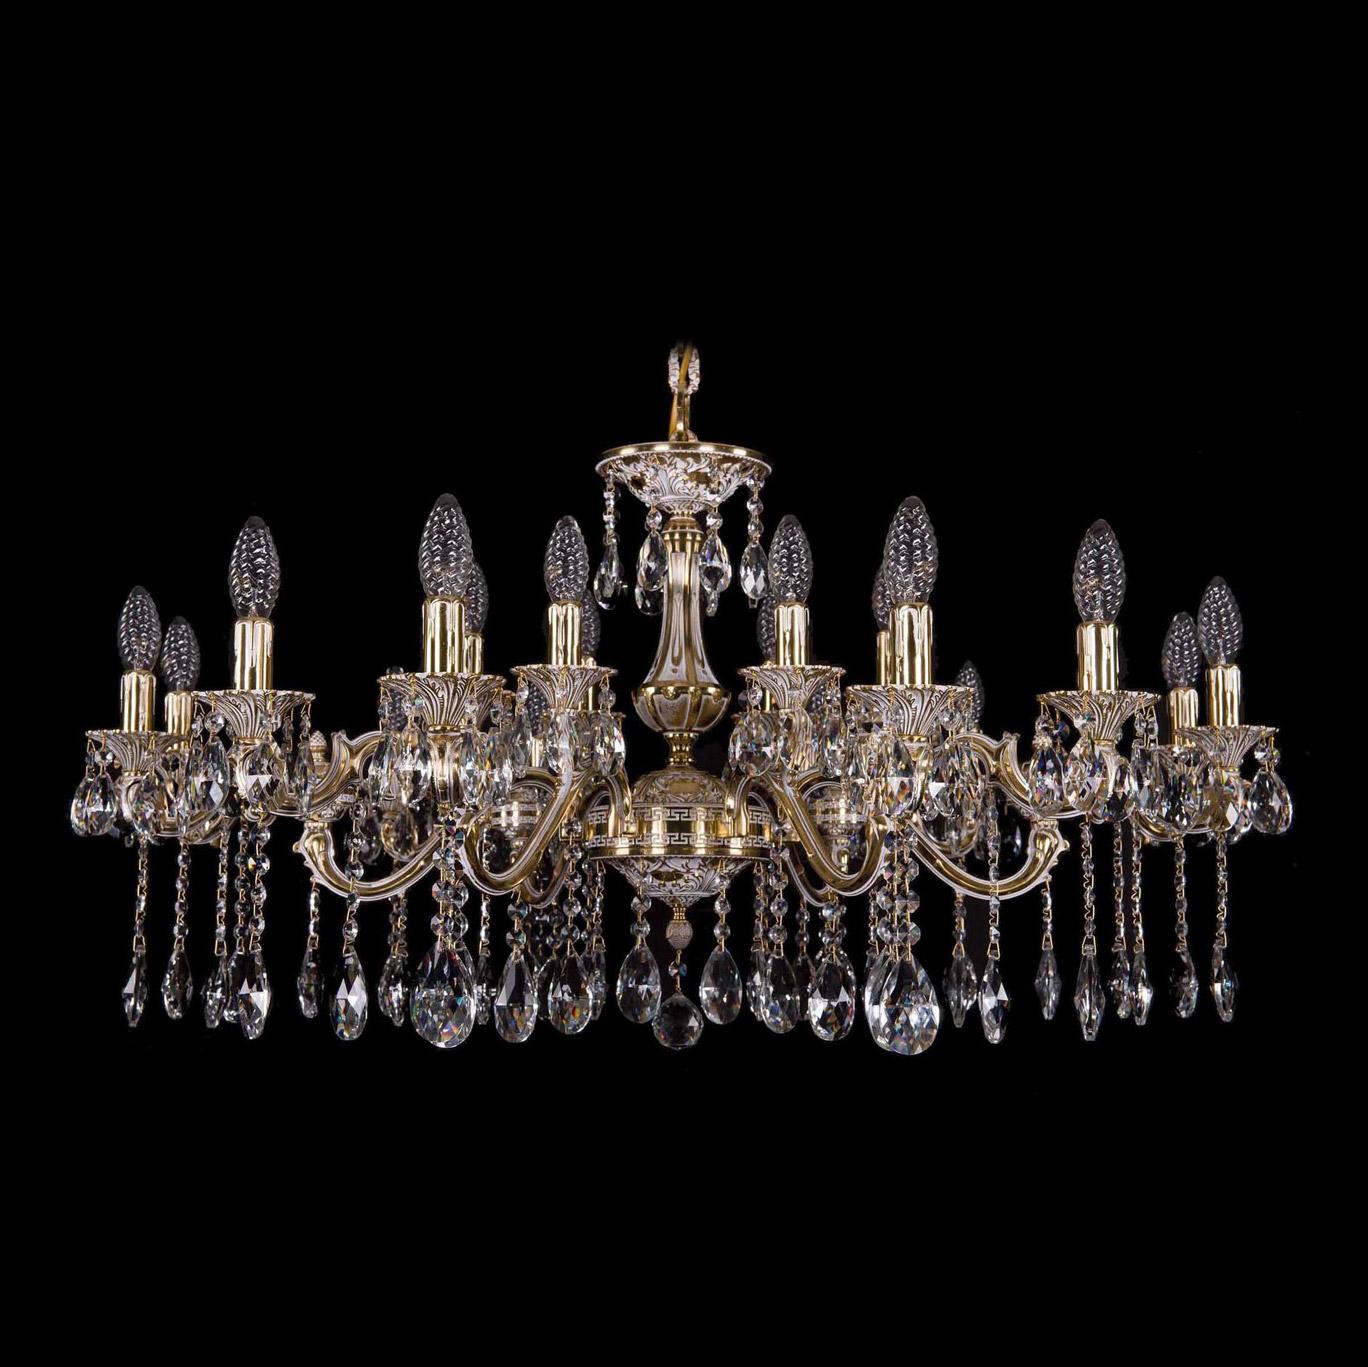 Bohemia Ivele Crystal 1703/18/225+125/A GW люстра bohemia ivele crystal золото беленое 1702 10 335a